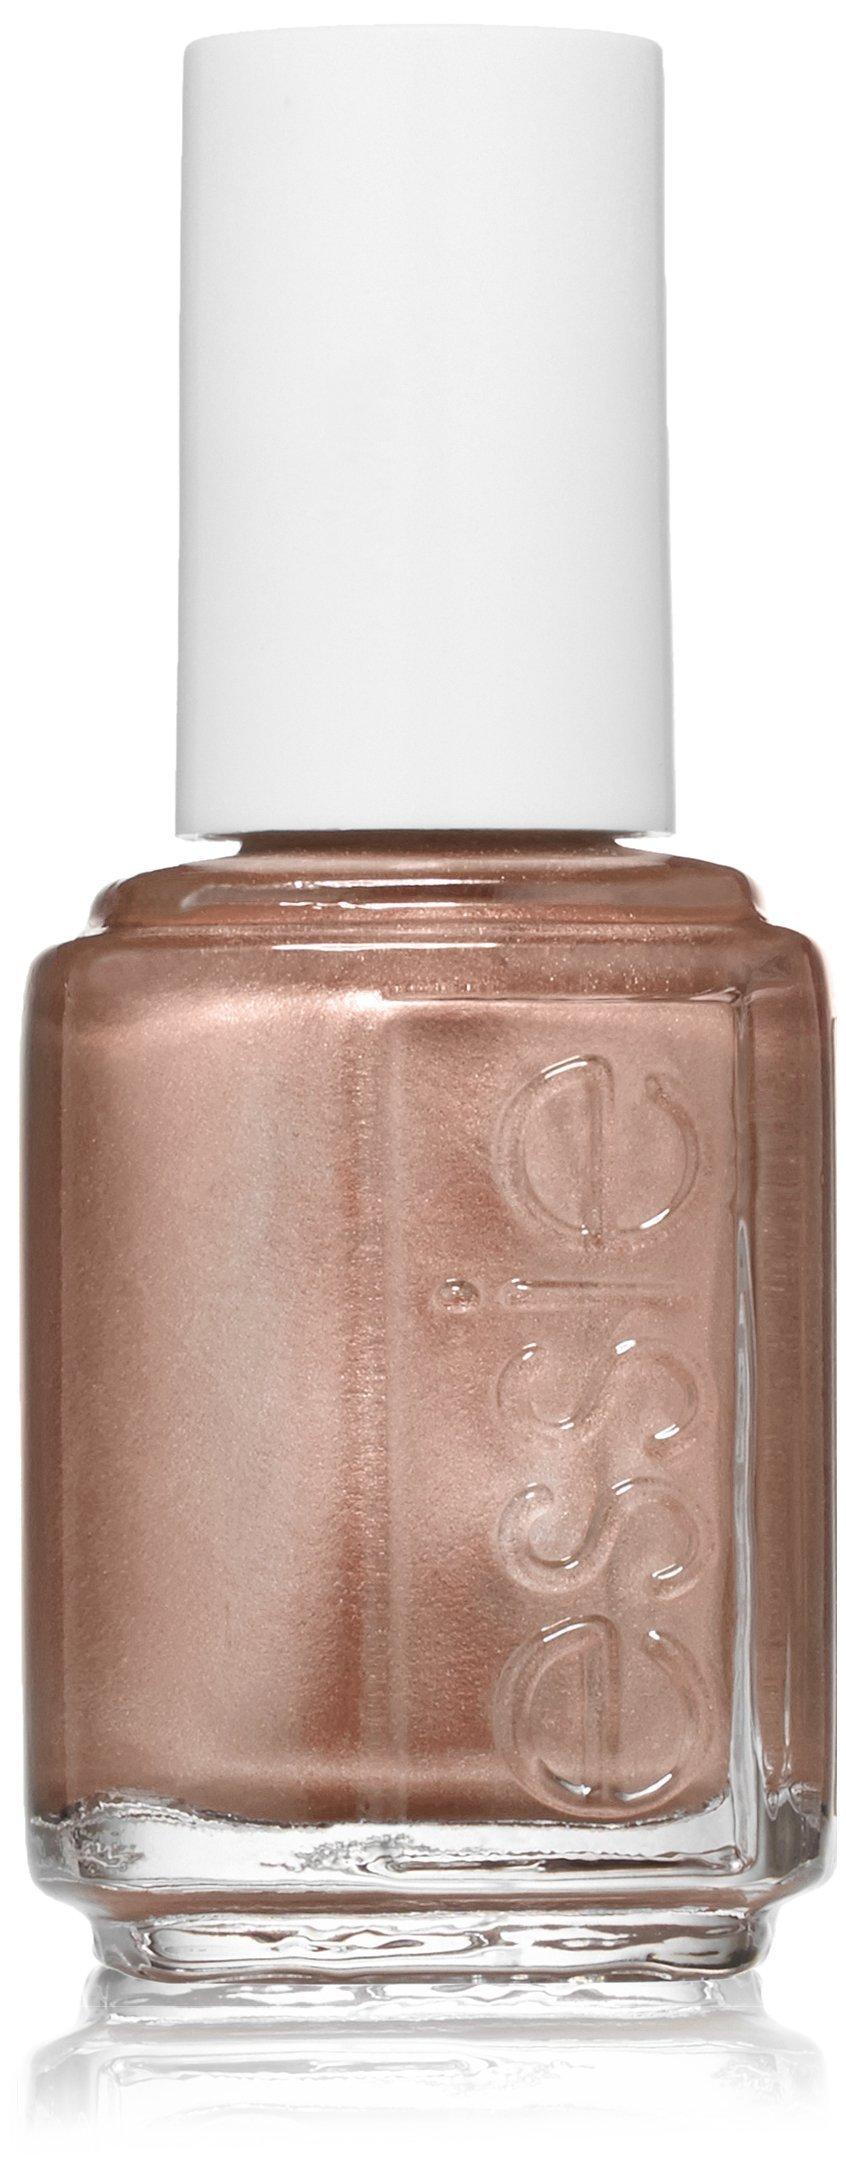 Amazon.com: essie luxeffects nail polish, a cut above, 0.46 fl. oz ...